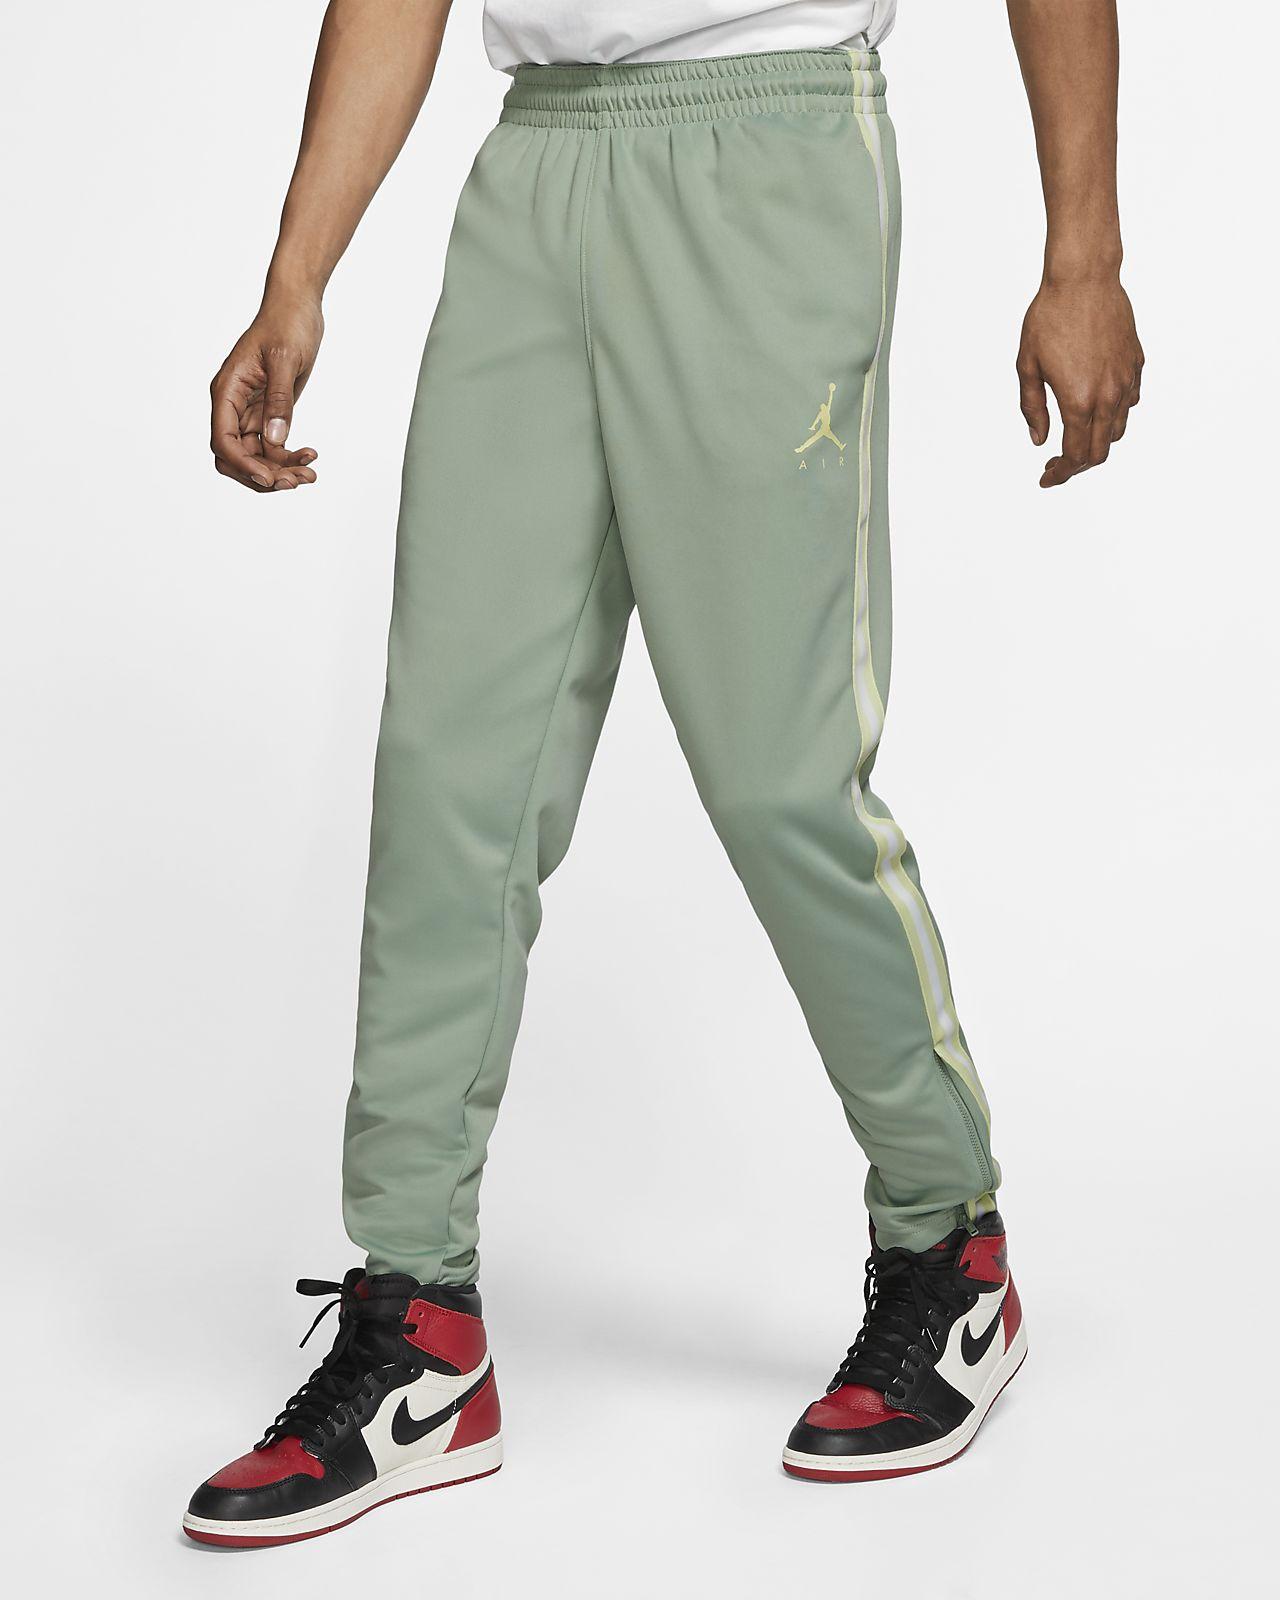 29884992bf6 Jordan Jumpman Flight Suit Men's Basketball Trousers. Nike.com ZA